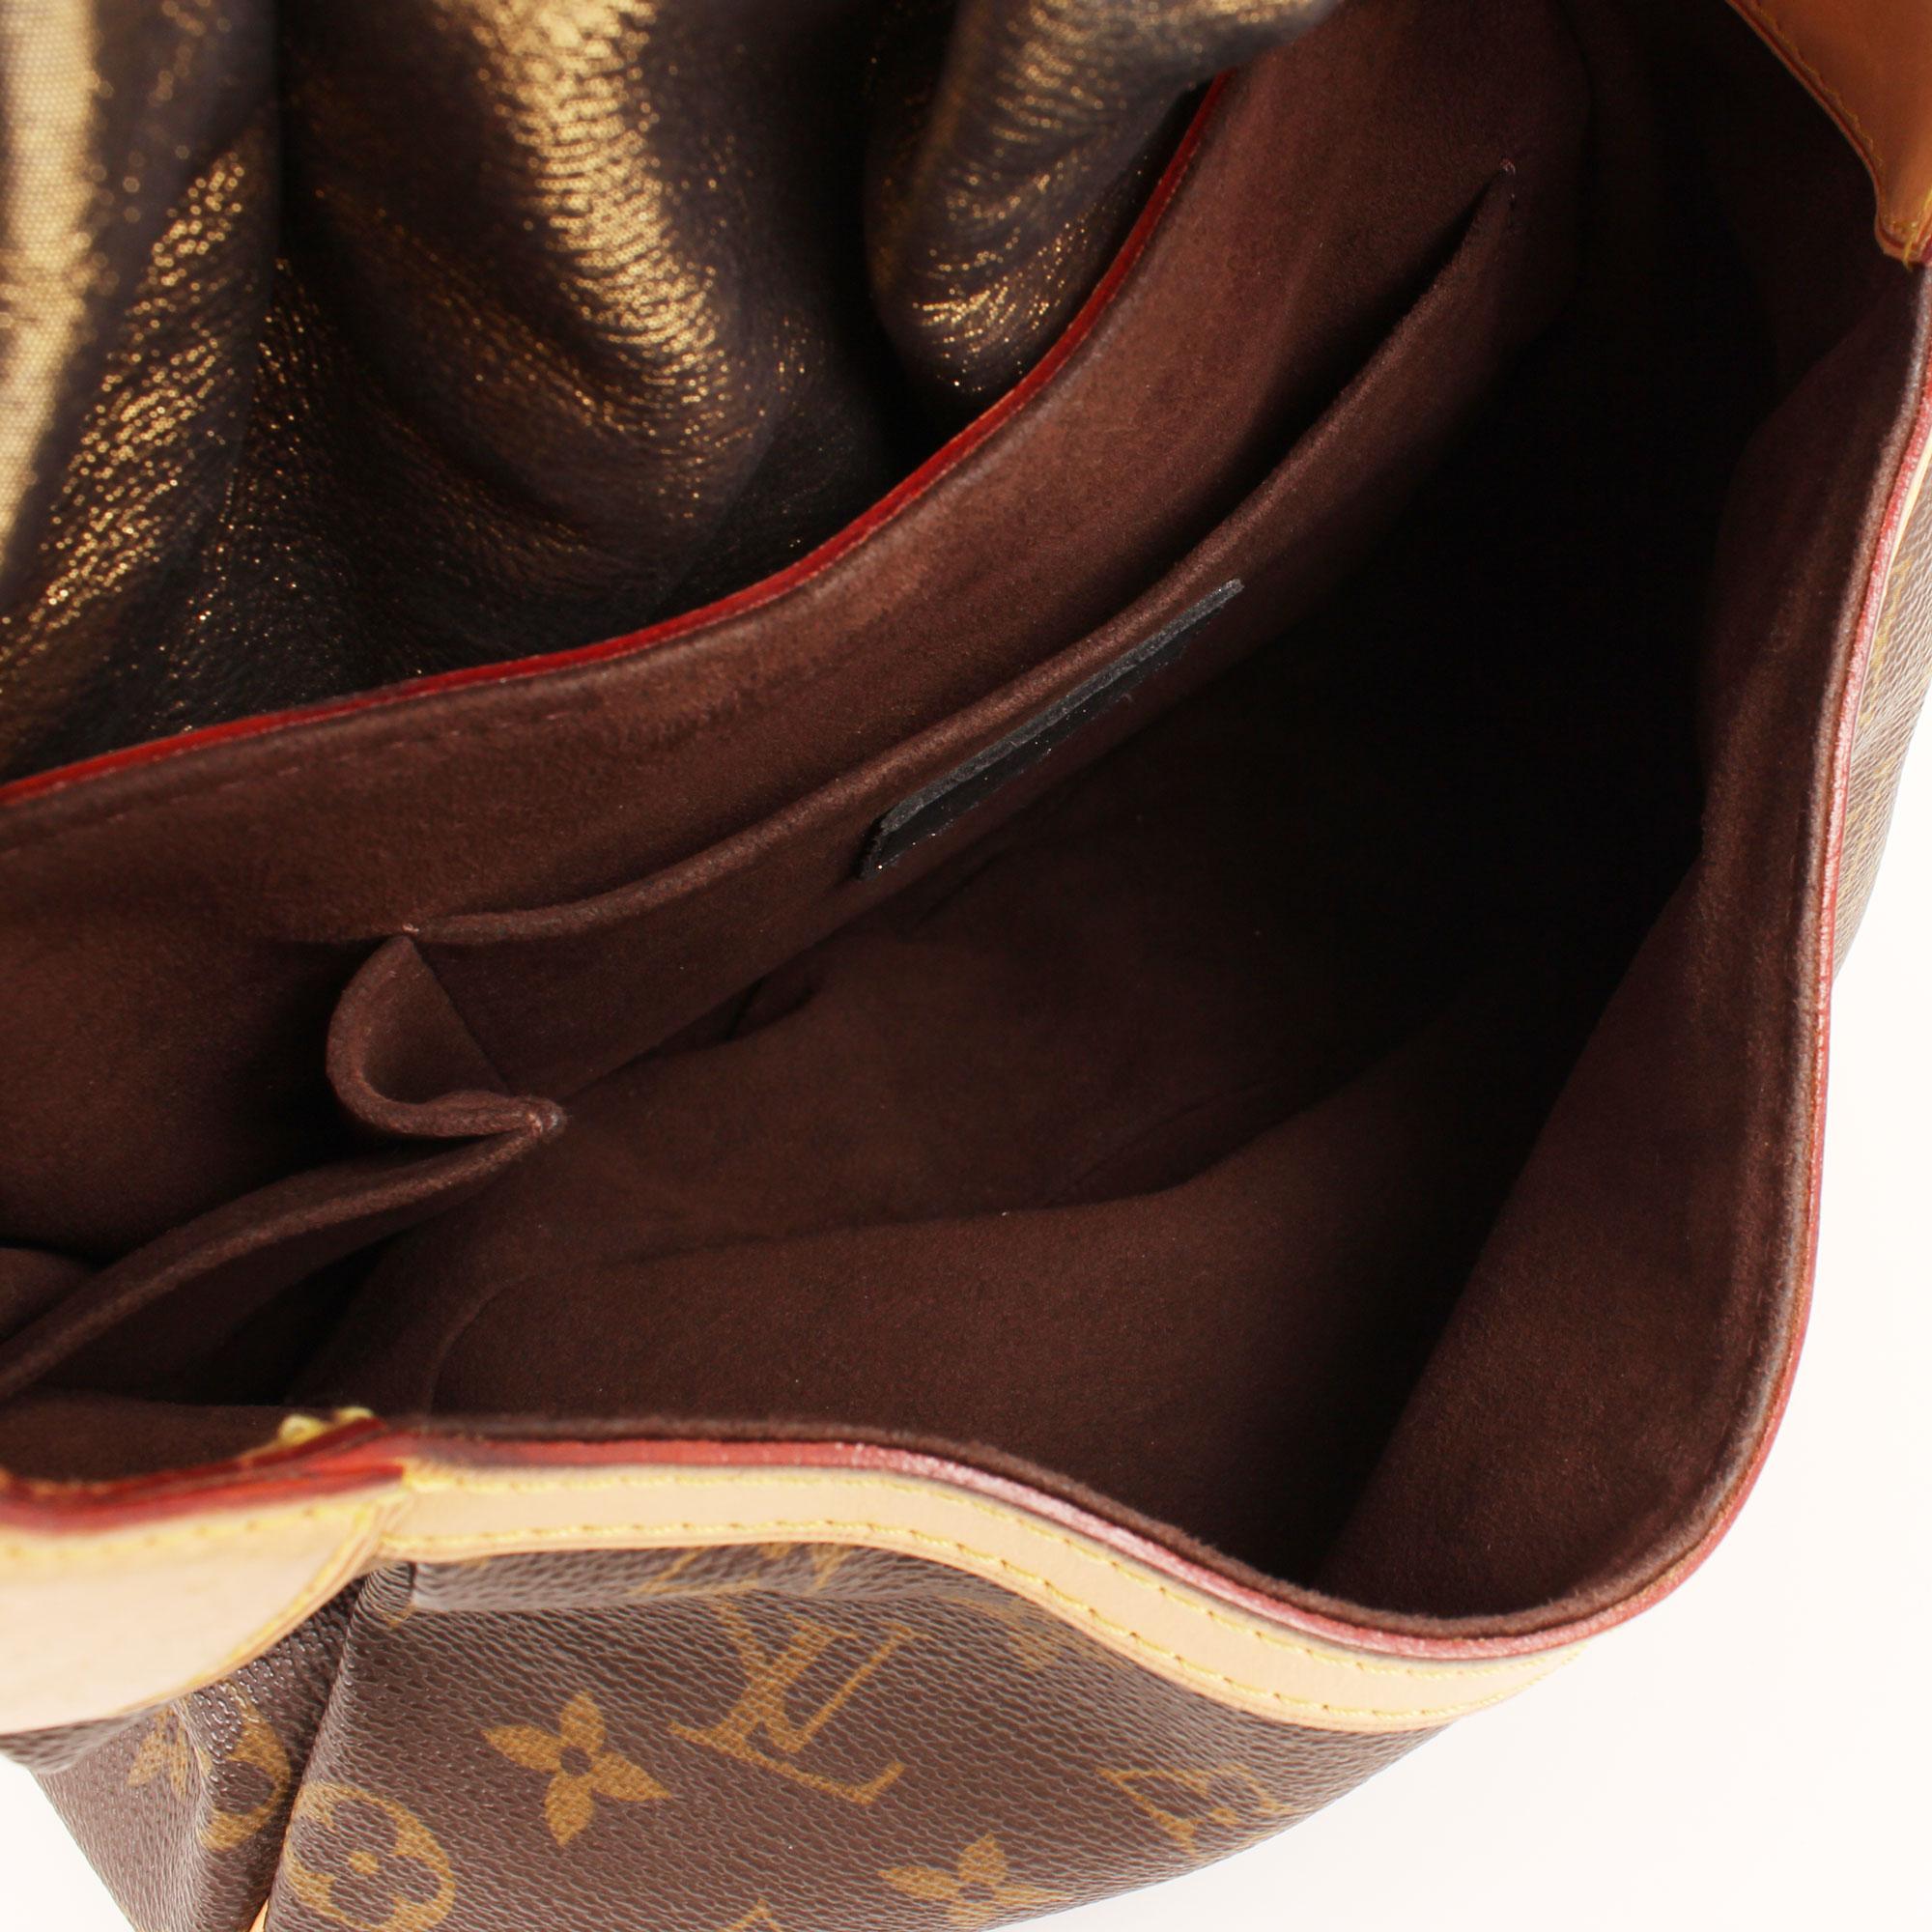 Imagen del interior del bolso louis vuitton kalahari pm